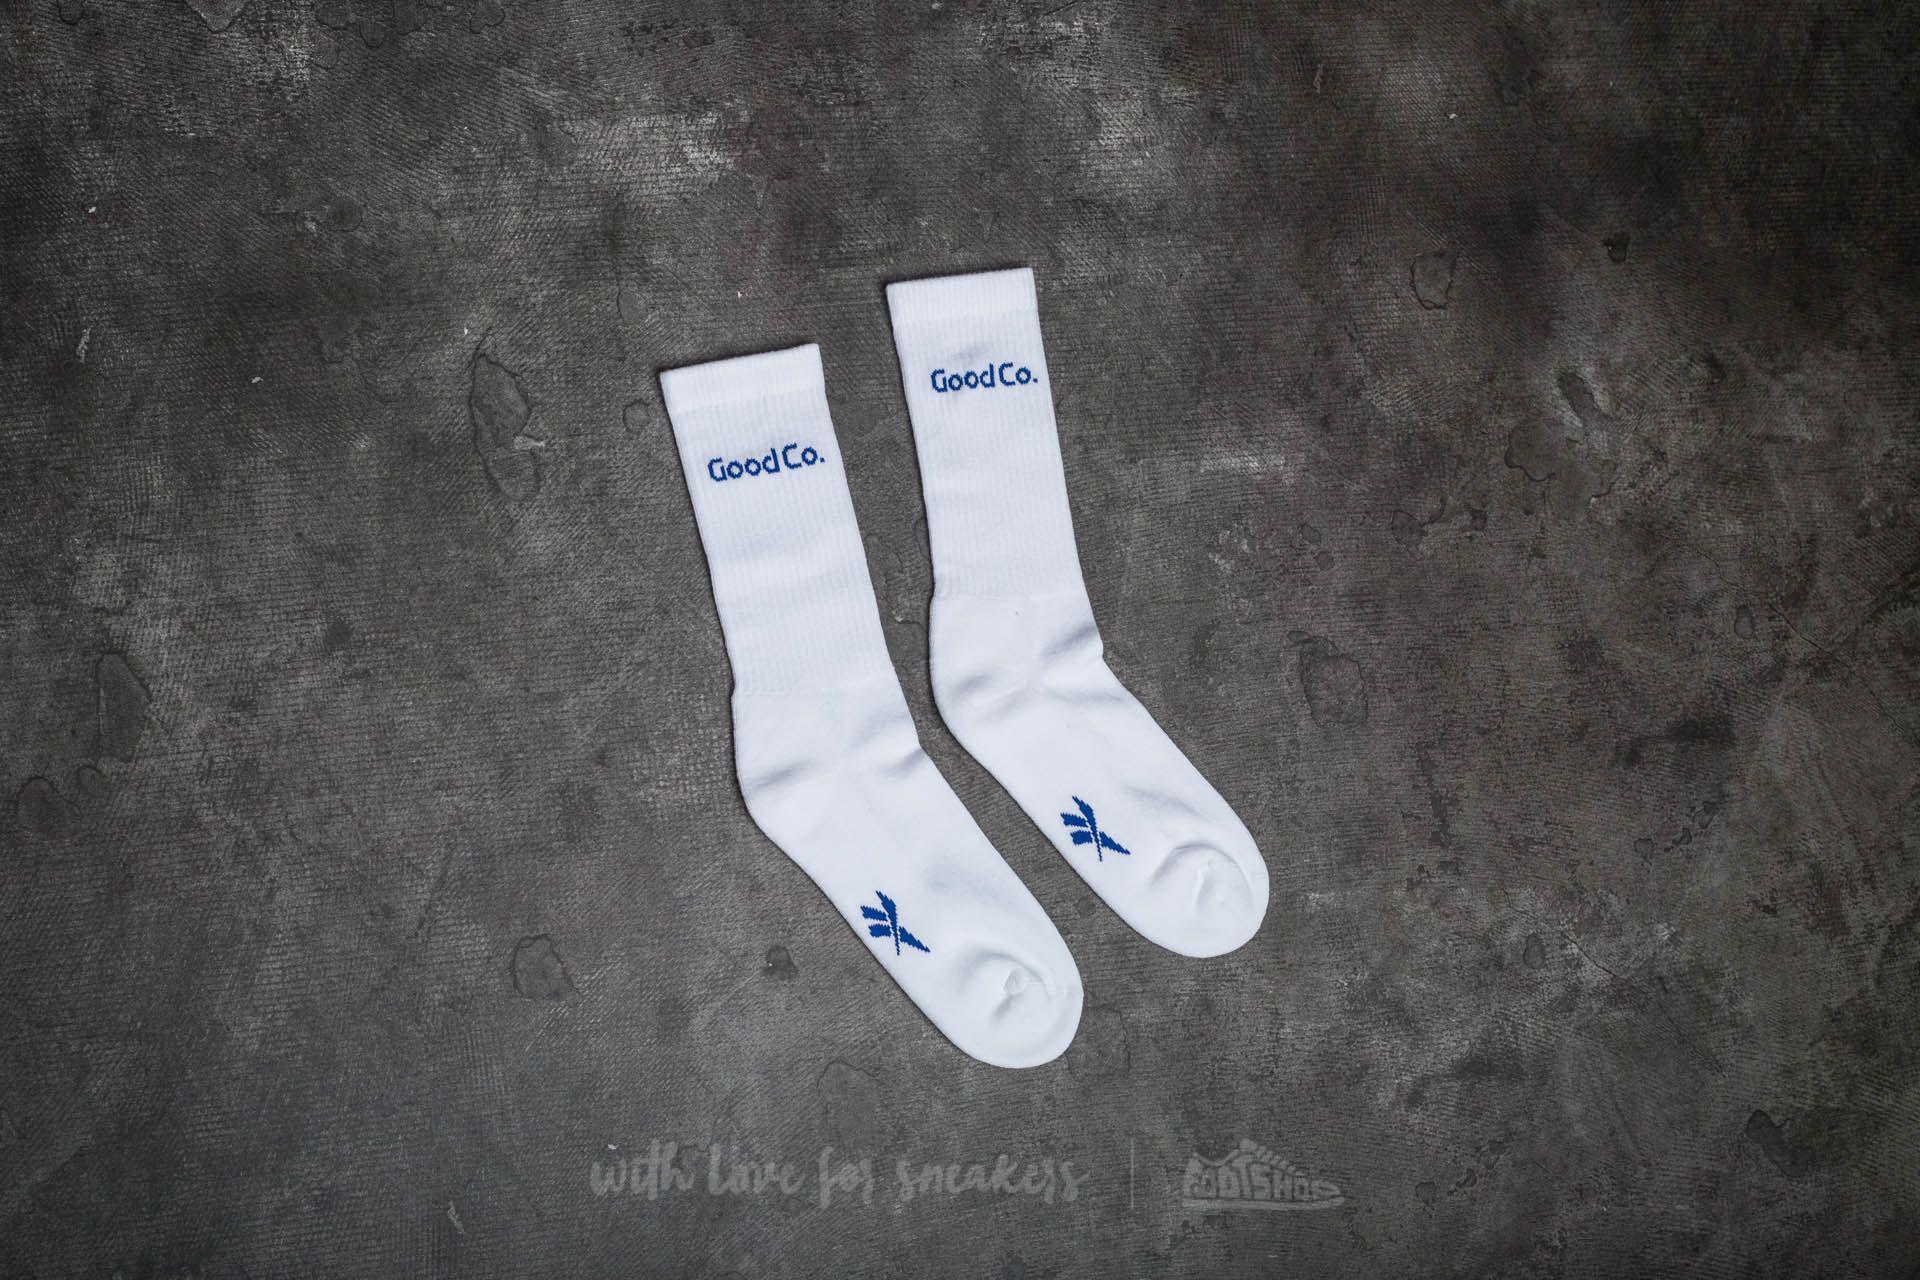 Lyst - Reebok X The Good Company Crew Socks White in White for Men b217a2d52